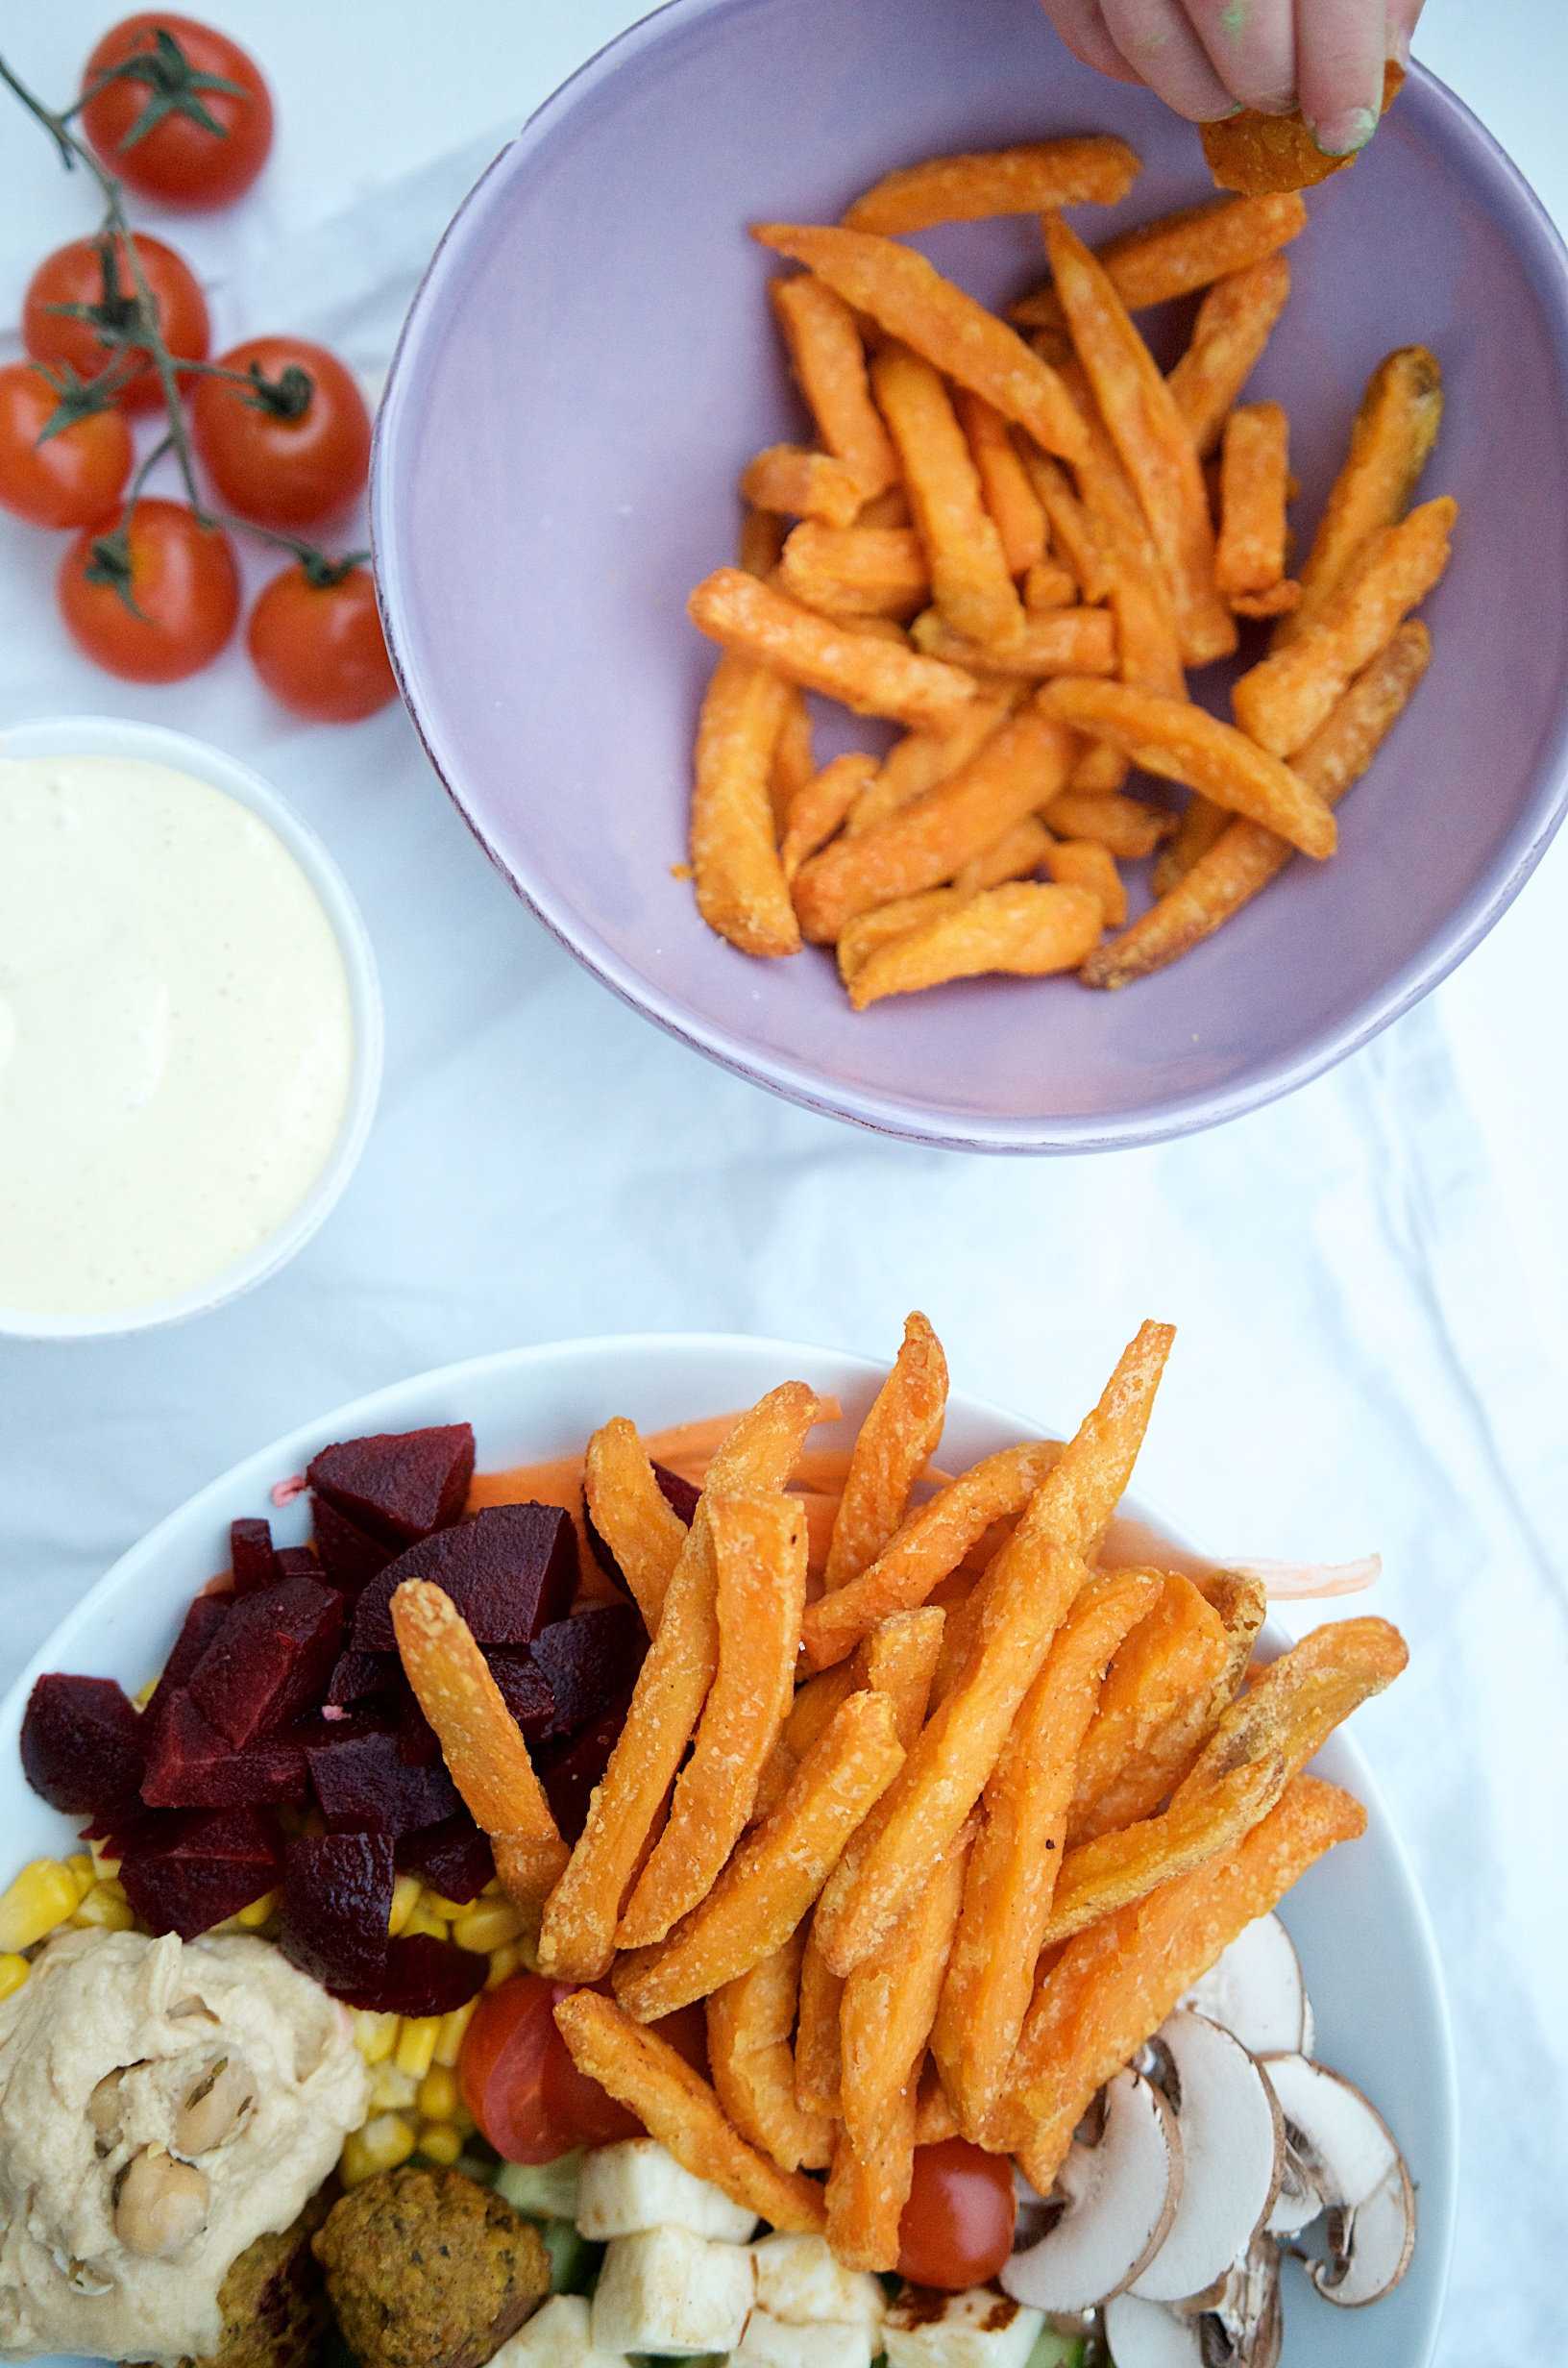 Falafelbowl mit Süßkartoffelpommes, selbstgemachtem Ketchup und Mayonnaise | Pinkepank